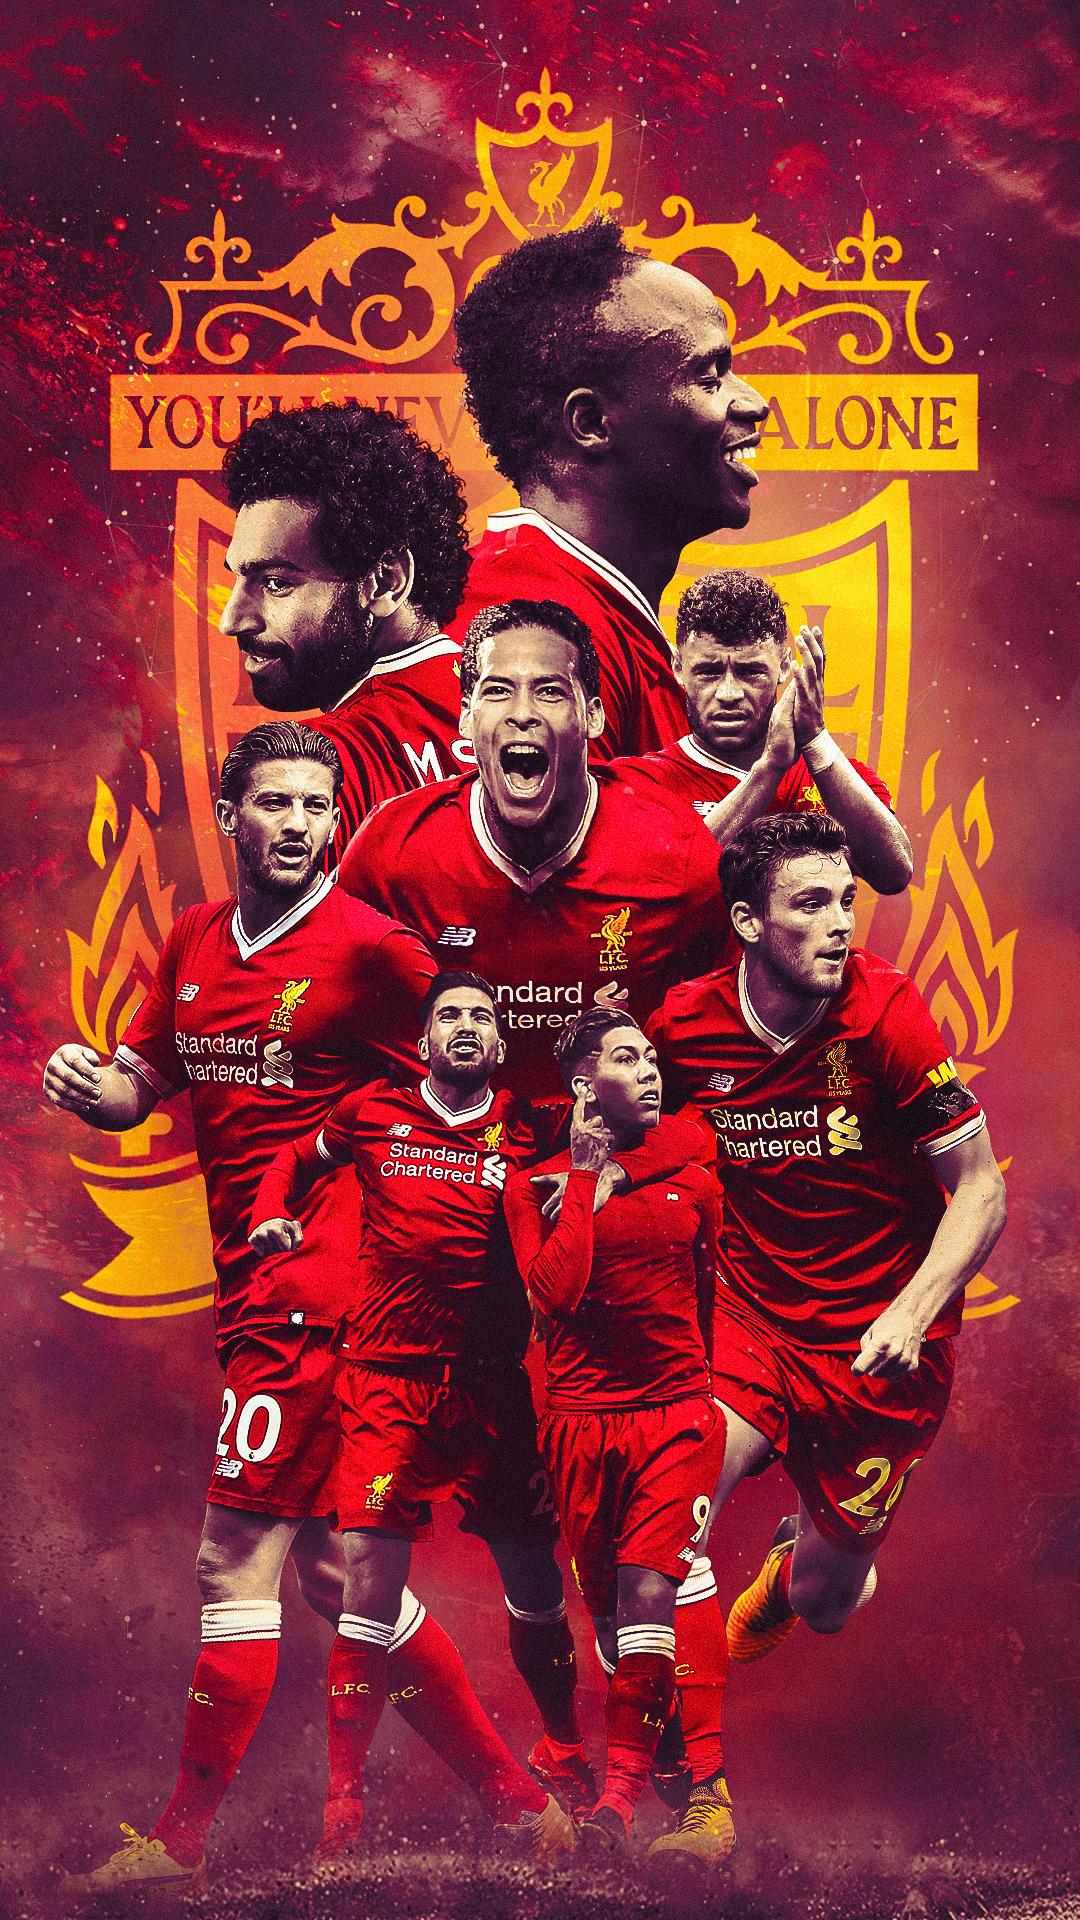 Liverpool - HD Wallpaper by Kerimov23 on DeviantArt